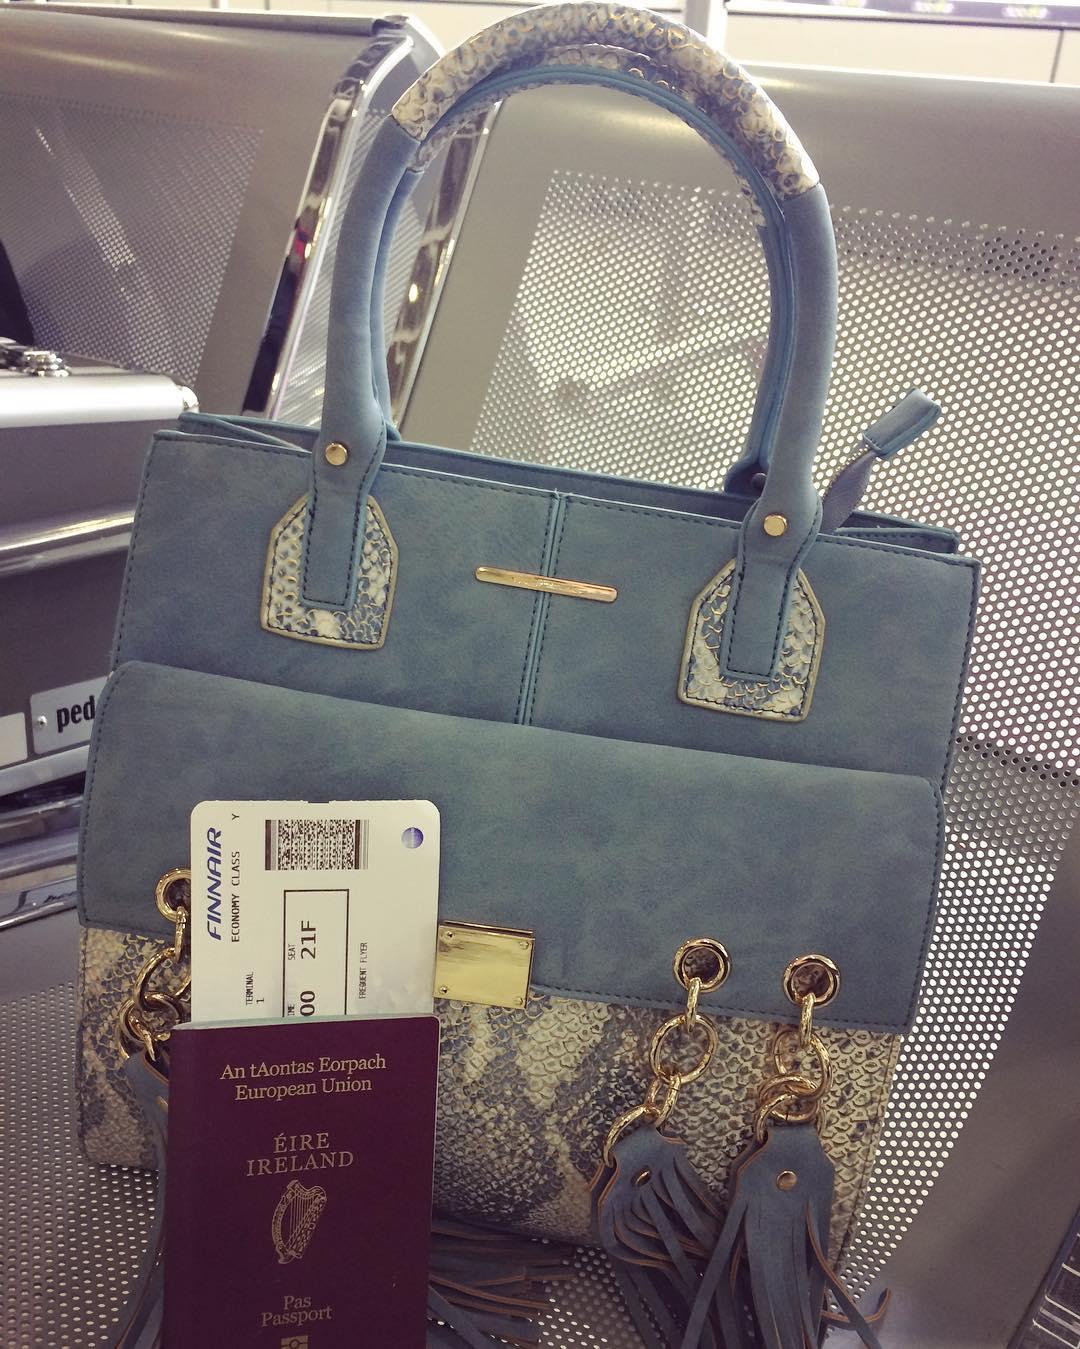 Finland bound ???? whoop @michellejohnston04 #finland #flying #airport #dublin #stpatricksday #week #weekend #thursday #followforfollow #follow4follow #follow4likes #like4likes #likeforfollow #shoutout #shoutoutforshoutout #shoutout4shoutout #commentforcomment #comment4comment #commentforlike #comment4like #excited #ireland #instagram #instagood #sallyyoung #bag